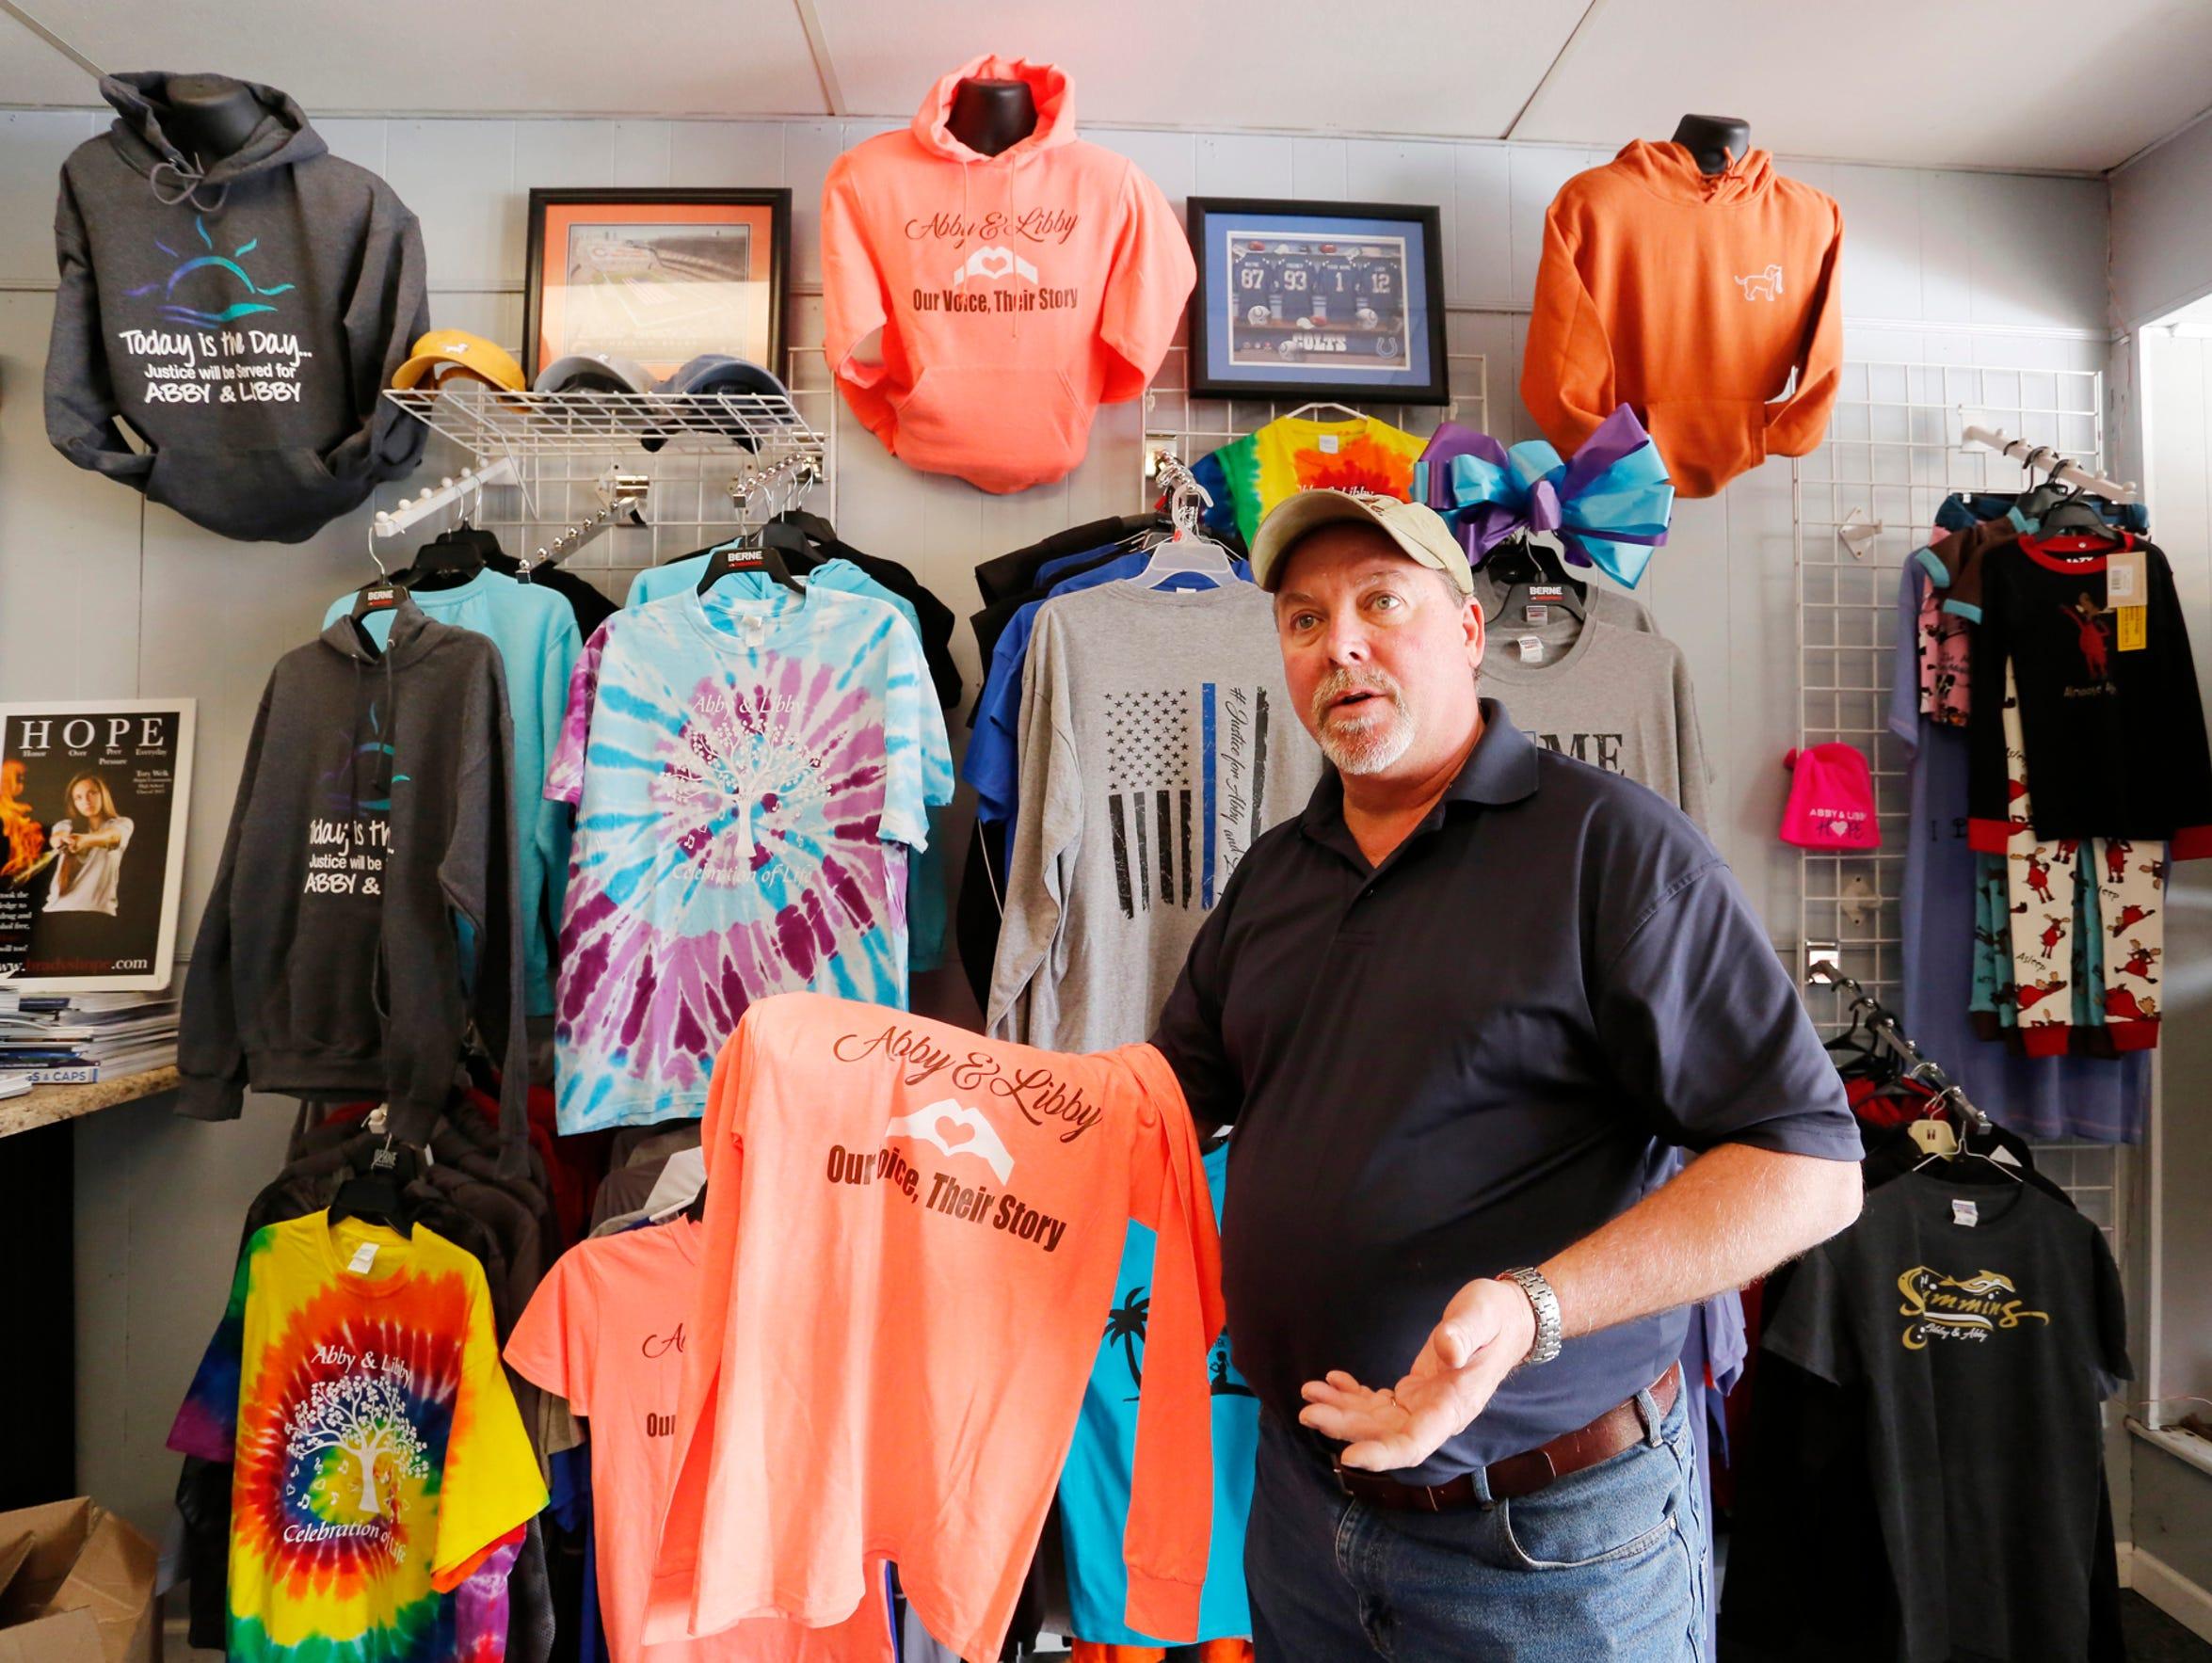 Mark Mendel shows shirt designs in honor of Liberty